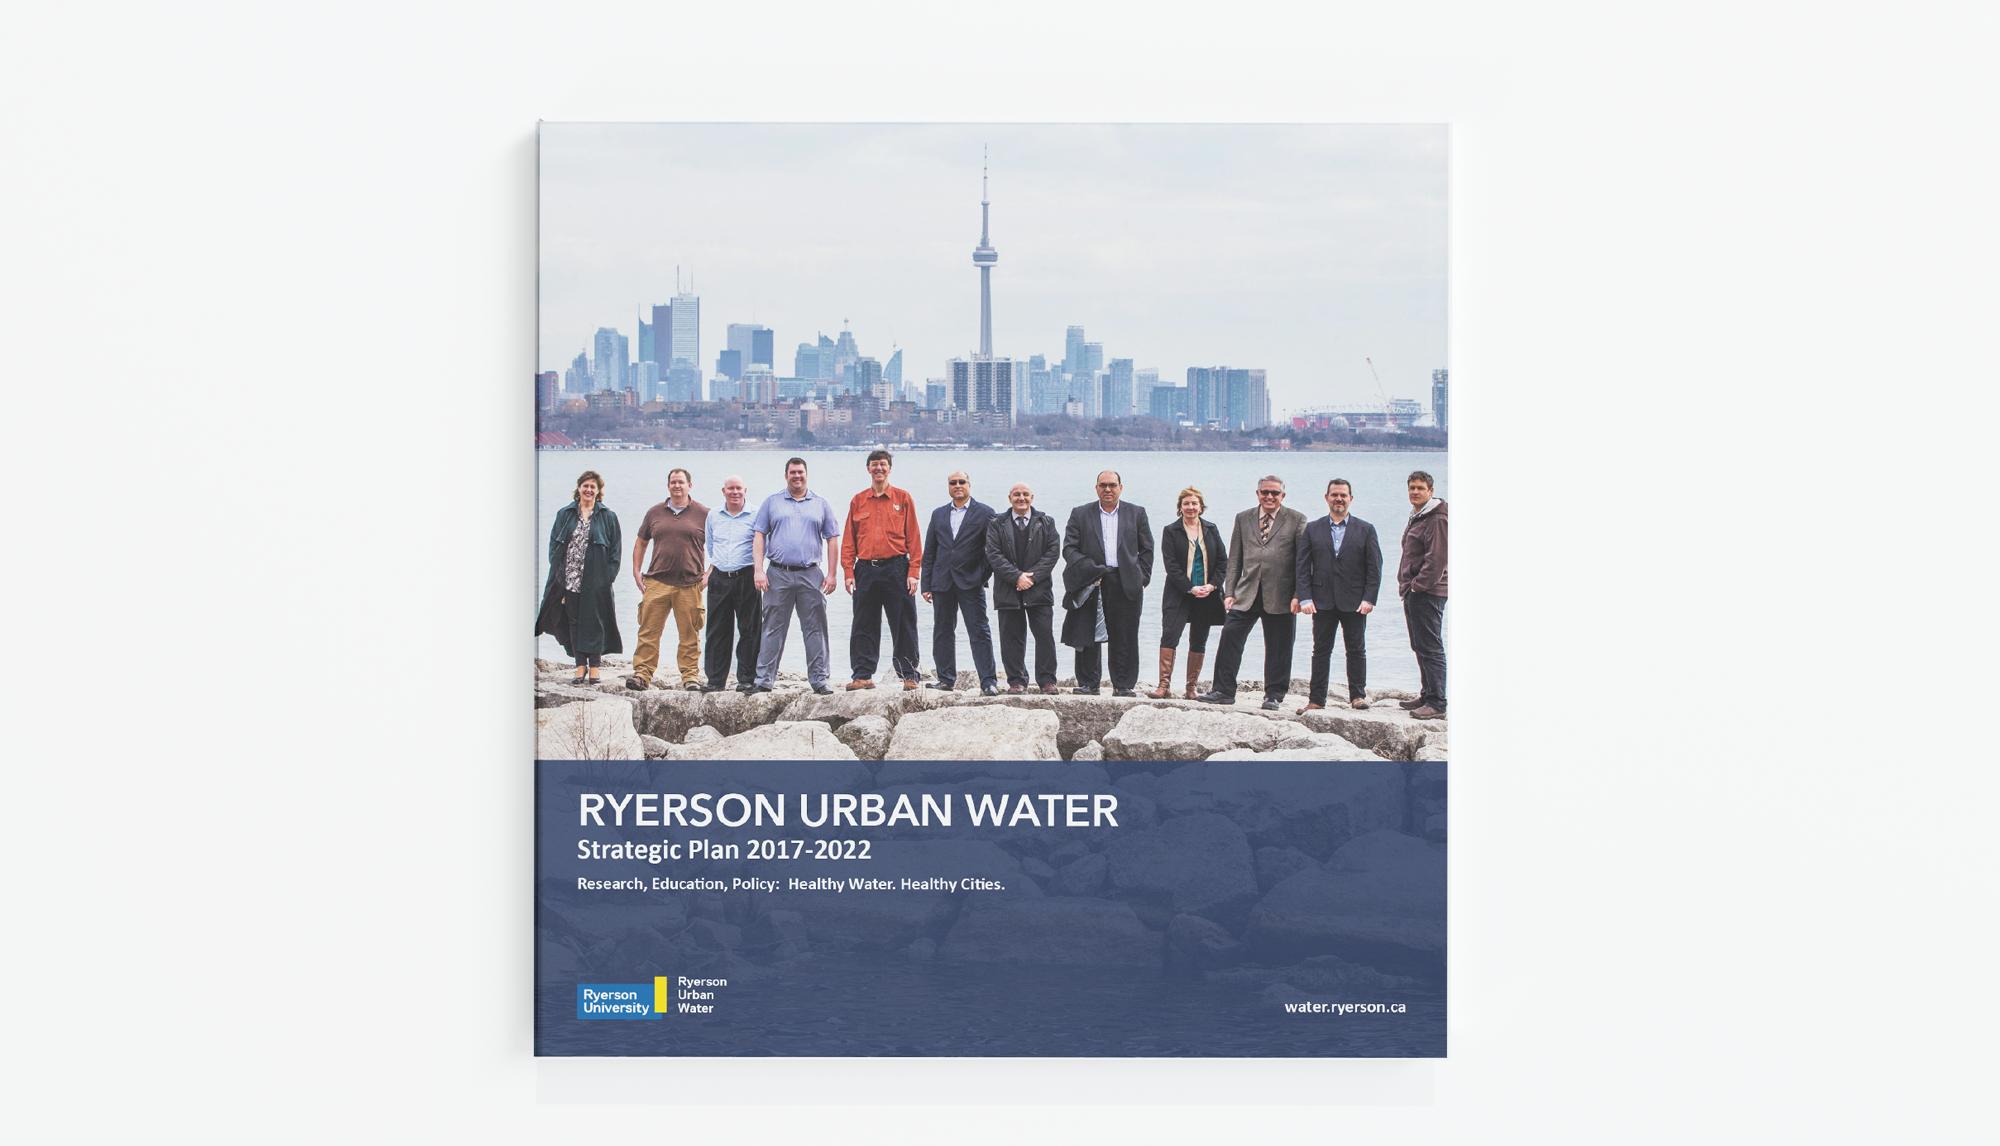 Ryerson Urban Water strategic plan cover